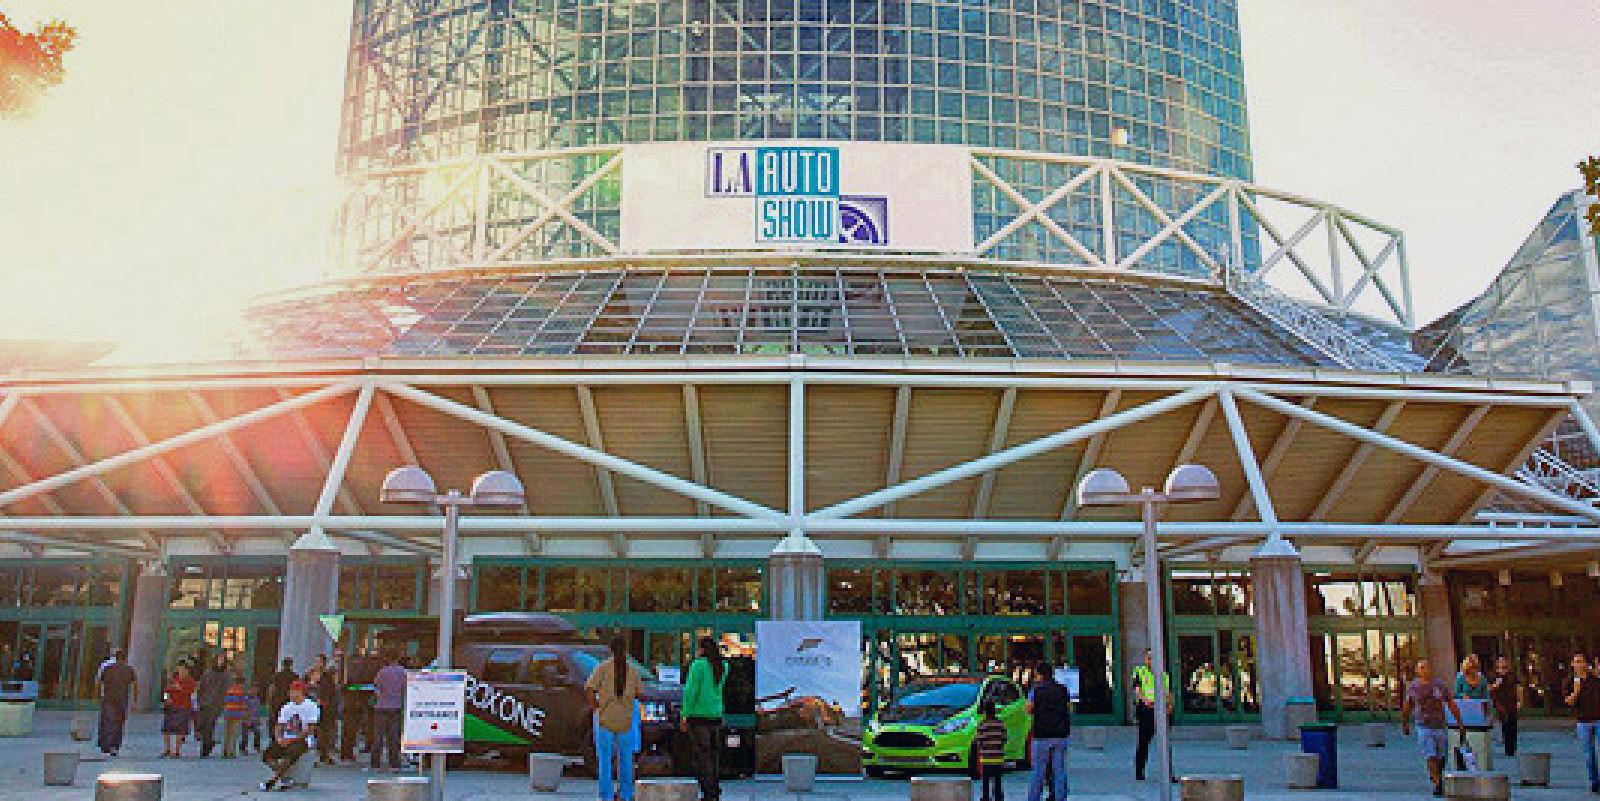 2019 LA Auto Show promises big Ford and Tesla EV reveals, startup news